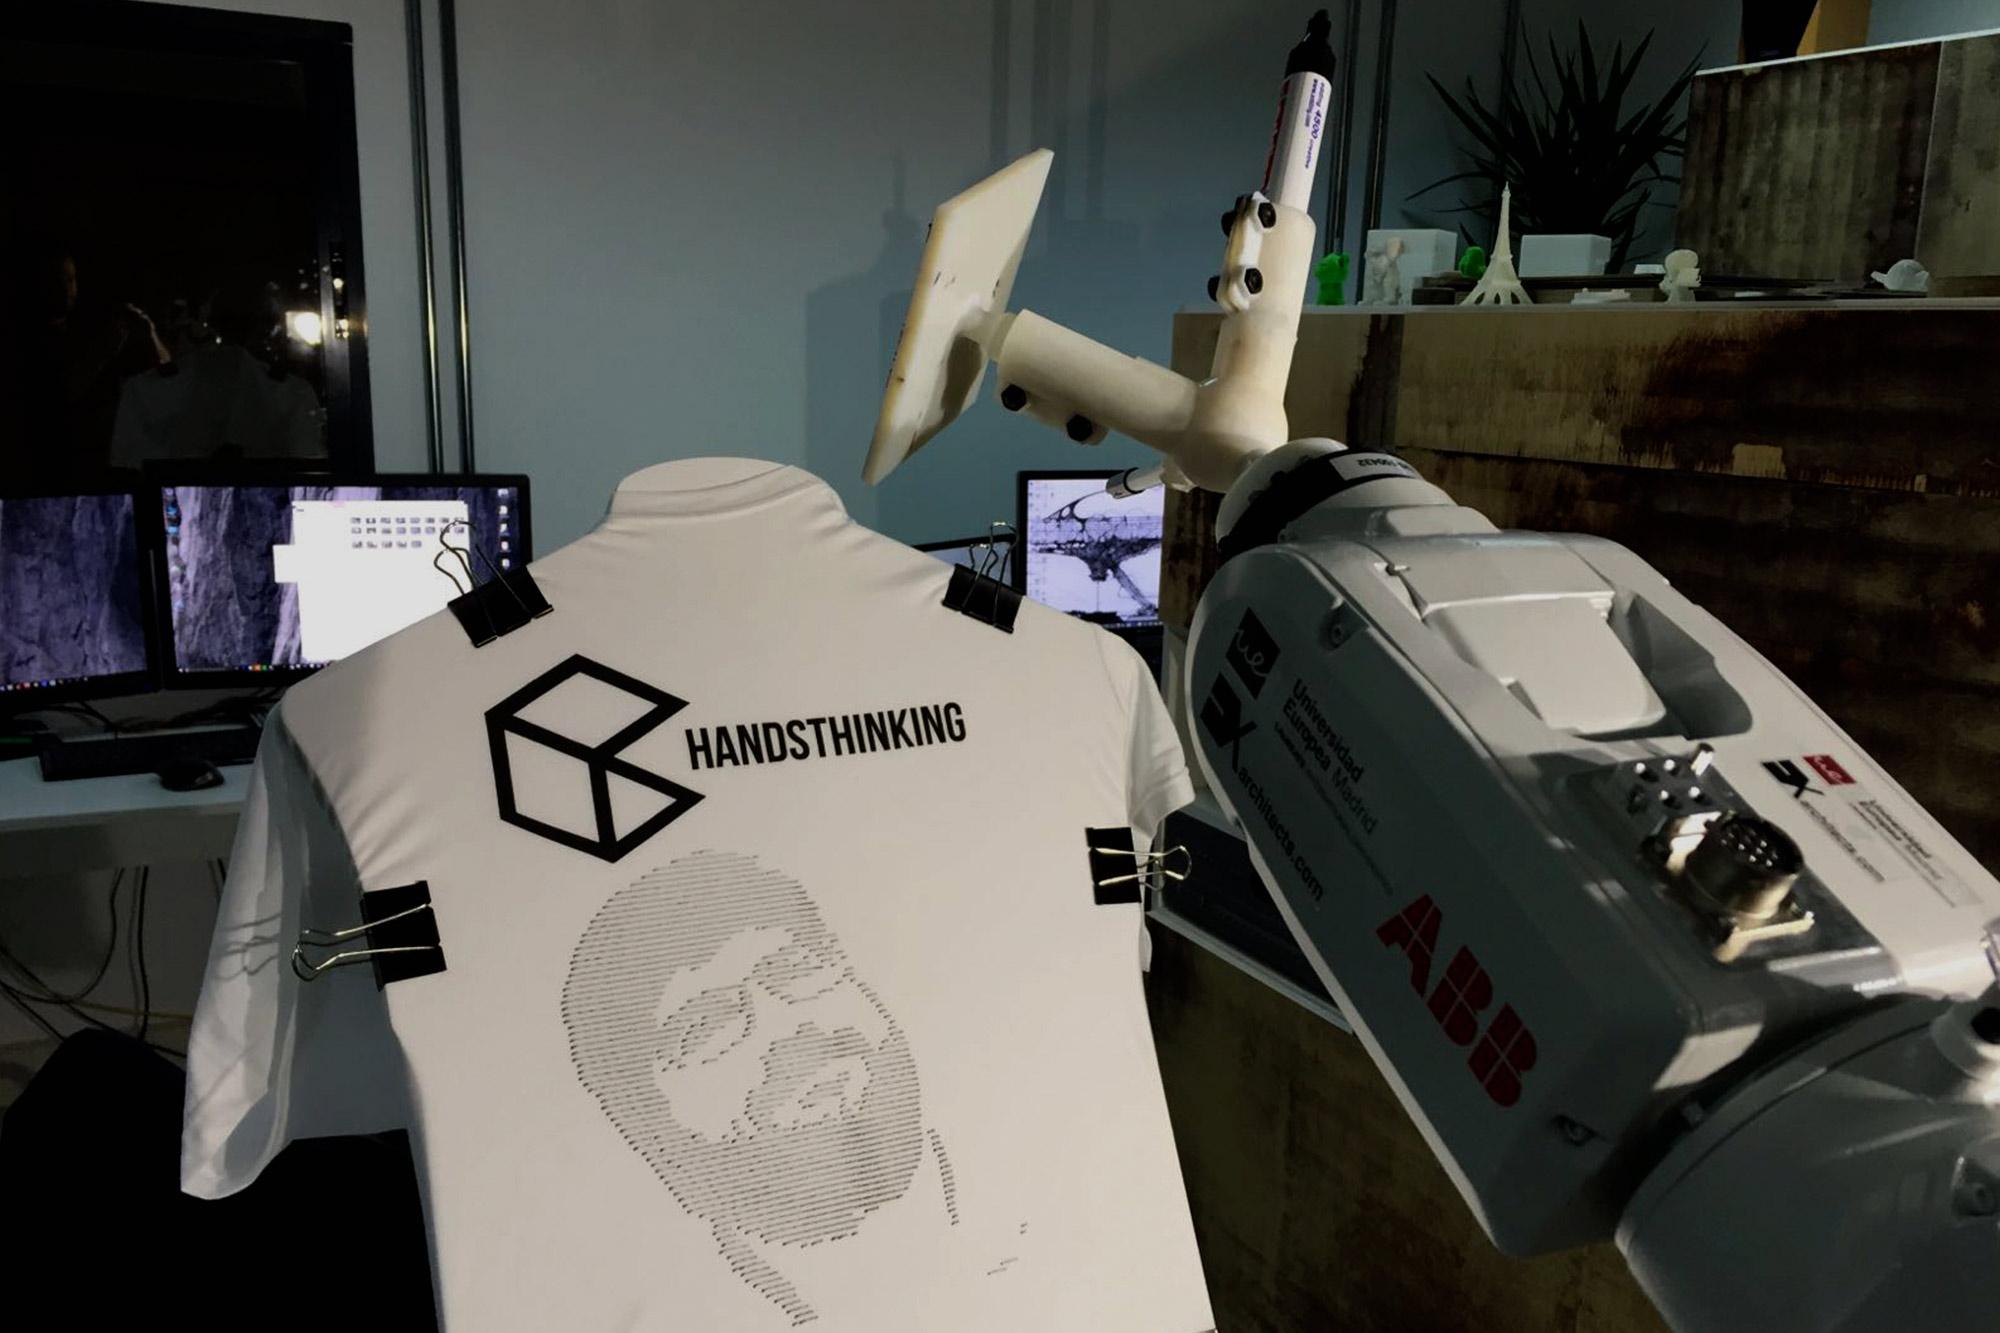 Retratos-Robots_-A_-techlab-_-EXarchitects_14